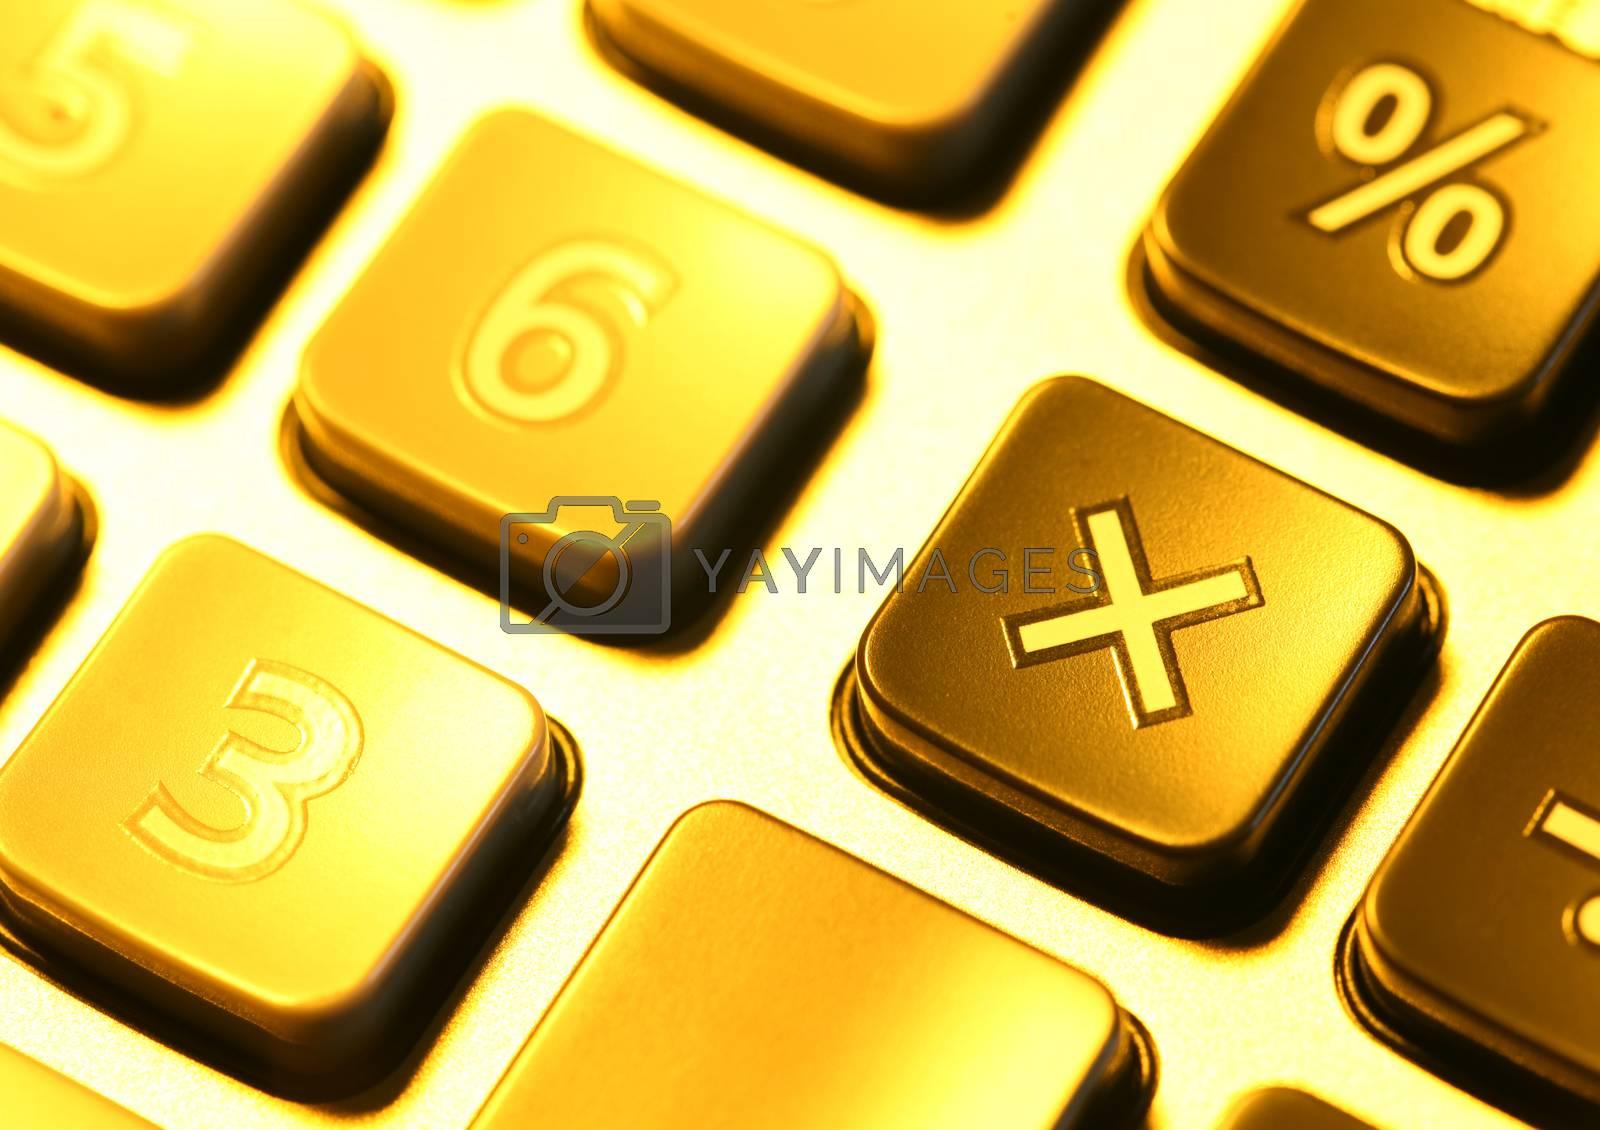 Royalty free image of Calculator by janaka